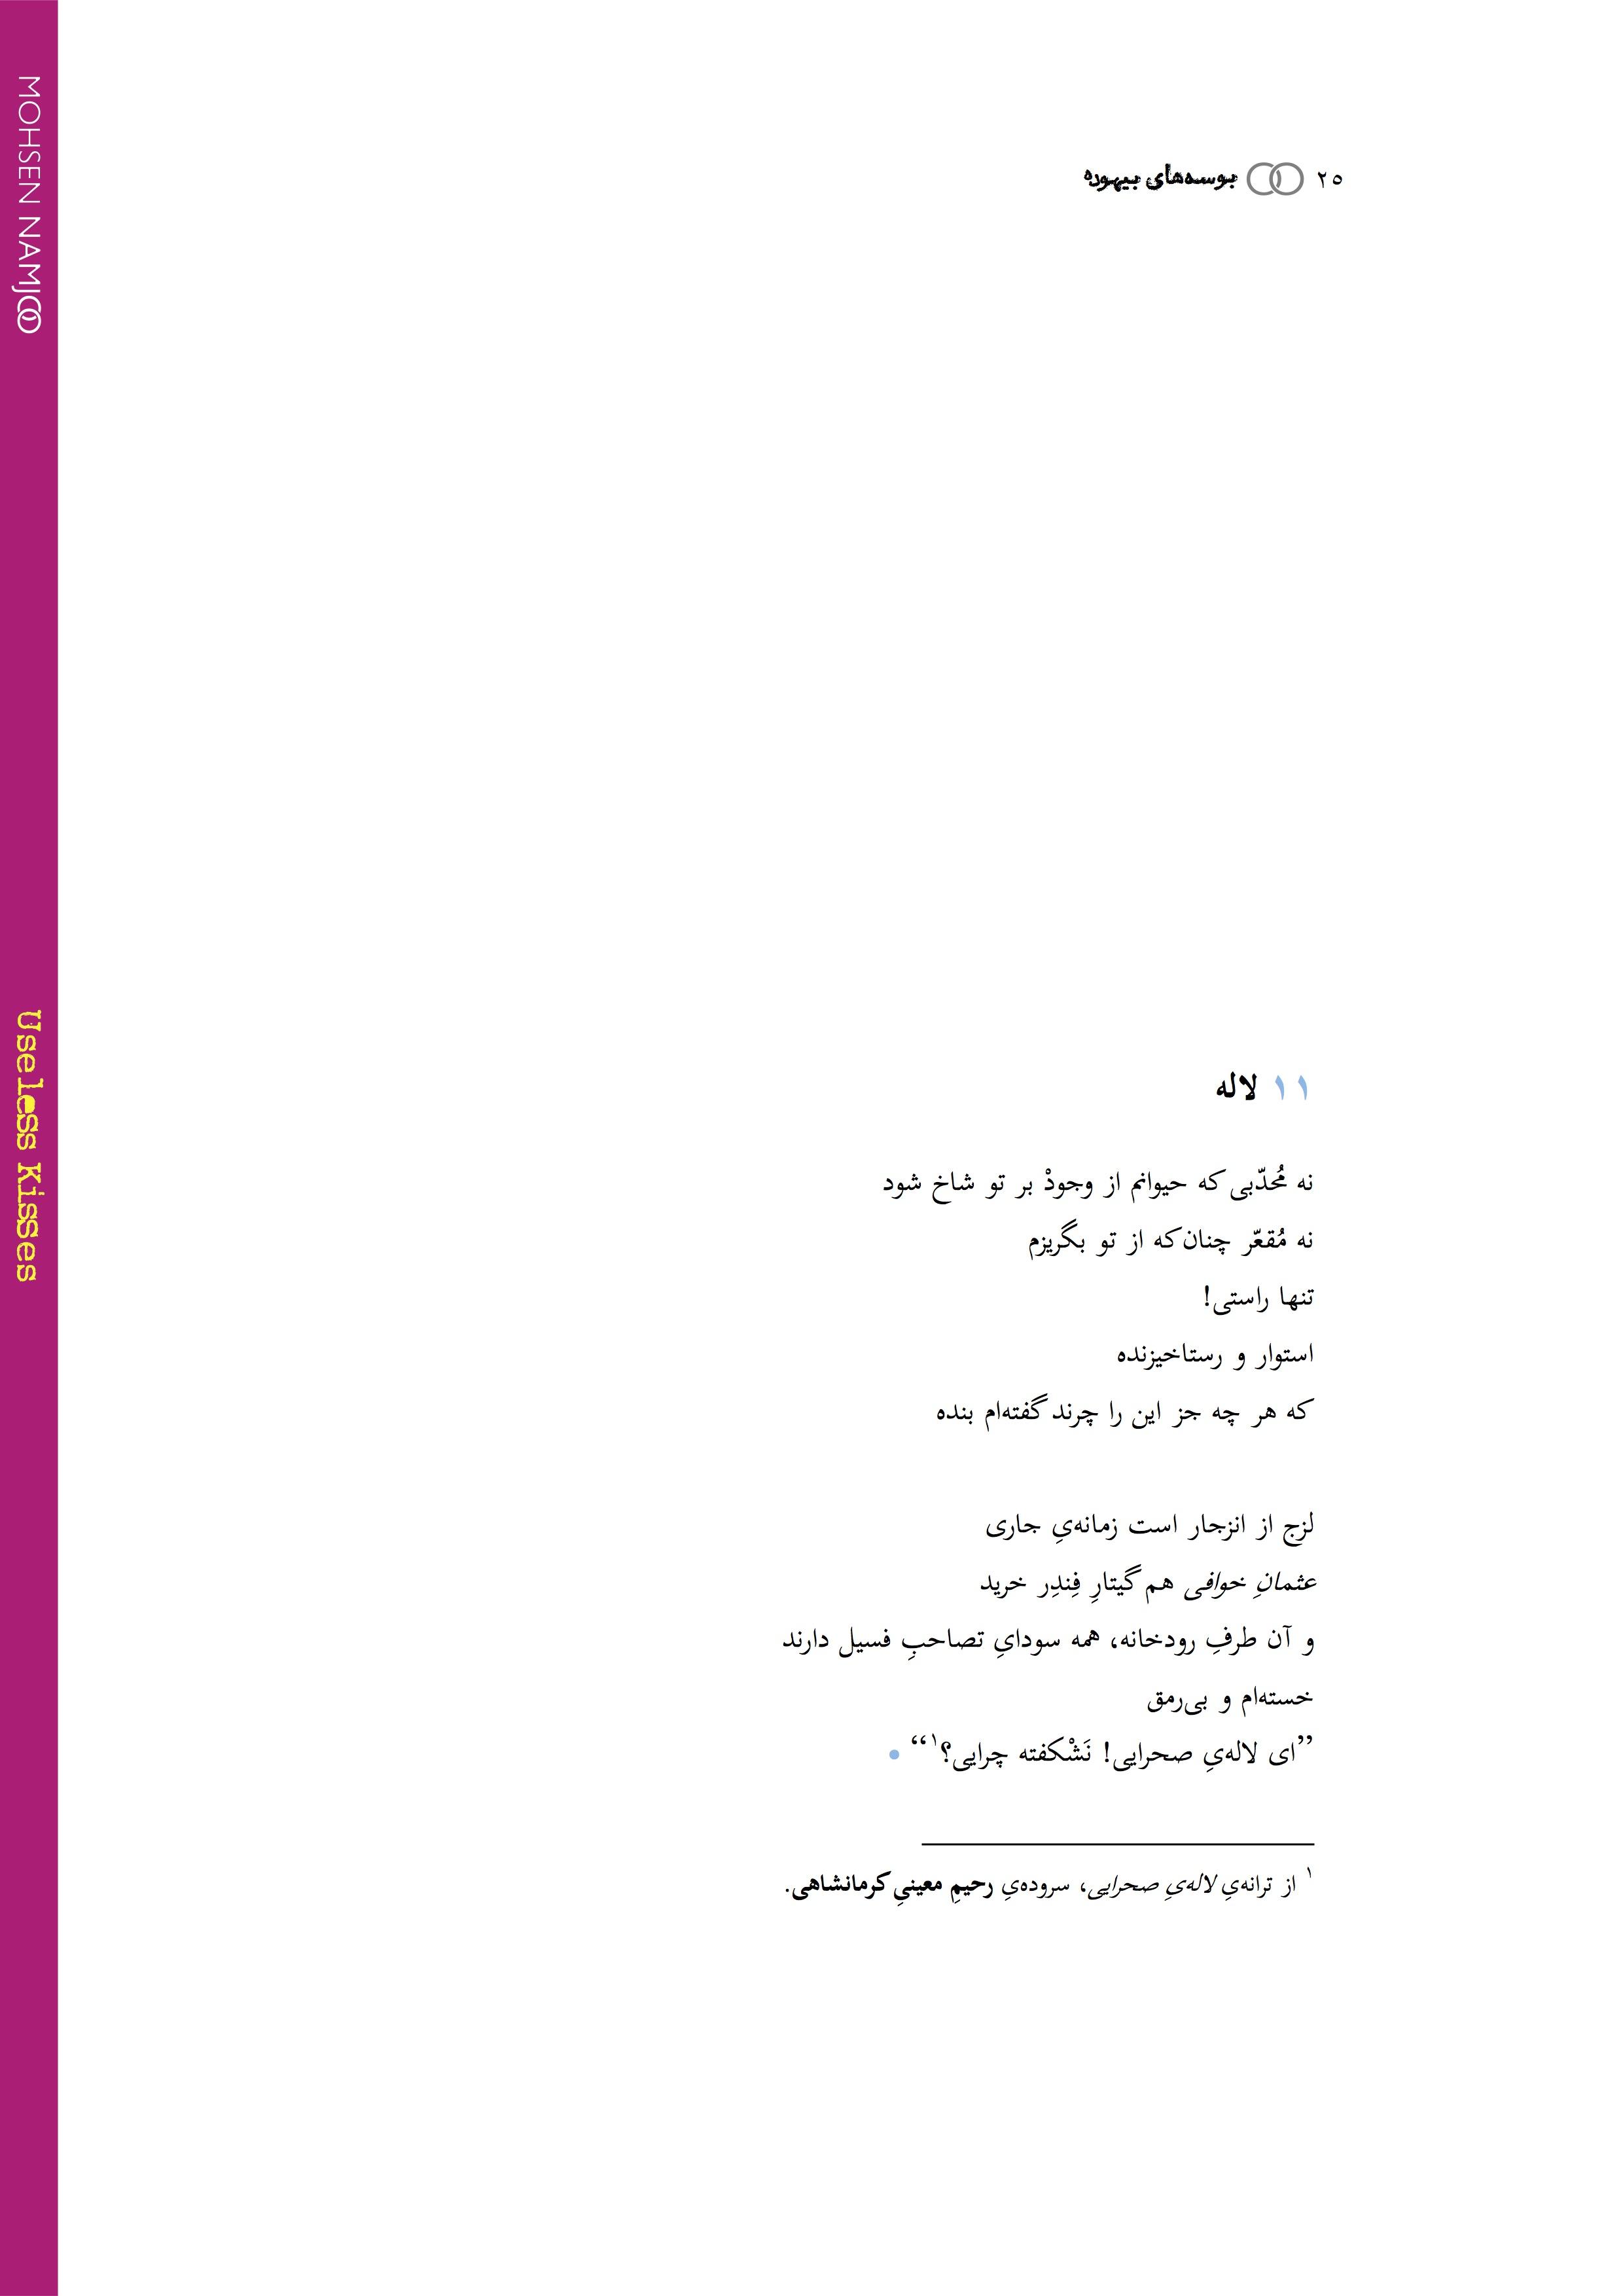 24Useless Kisses eBook (2nd Edition).jpg